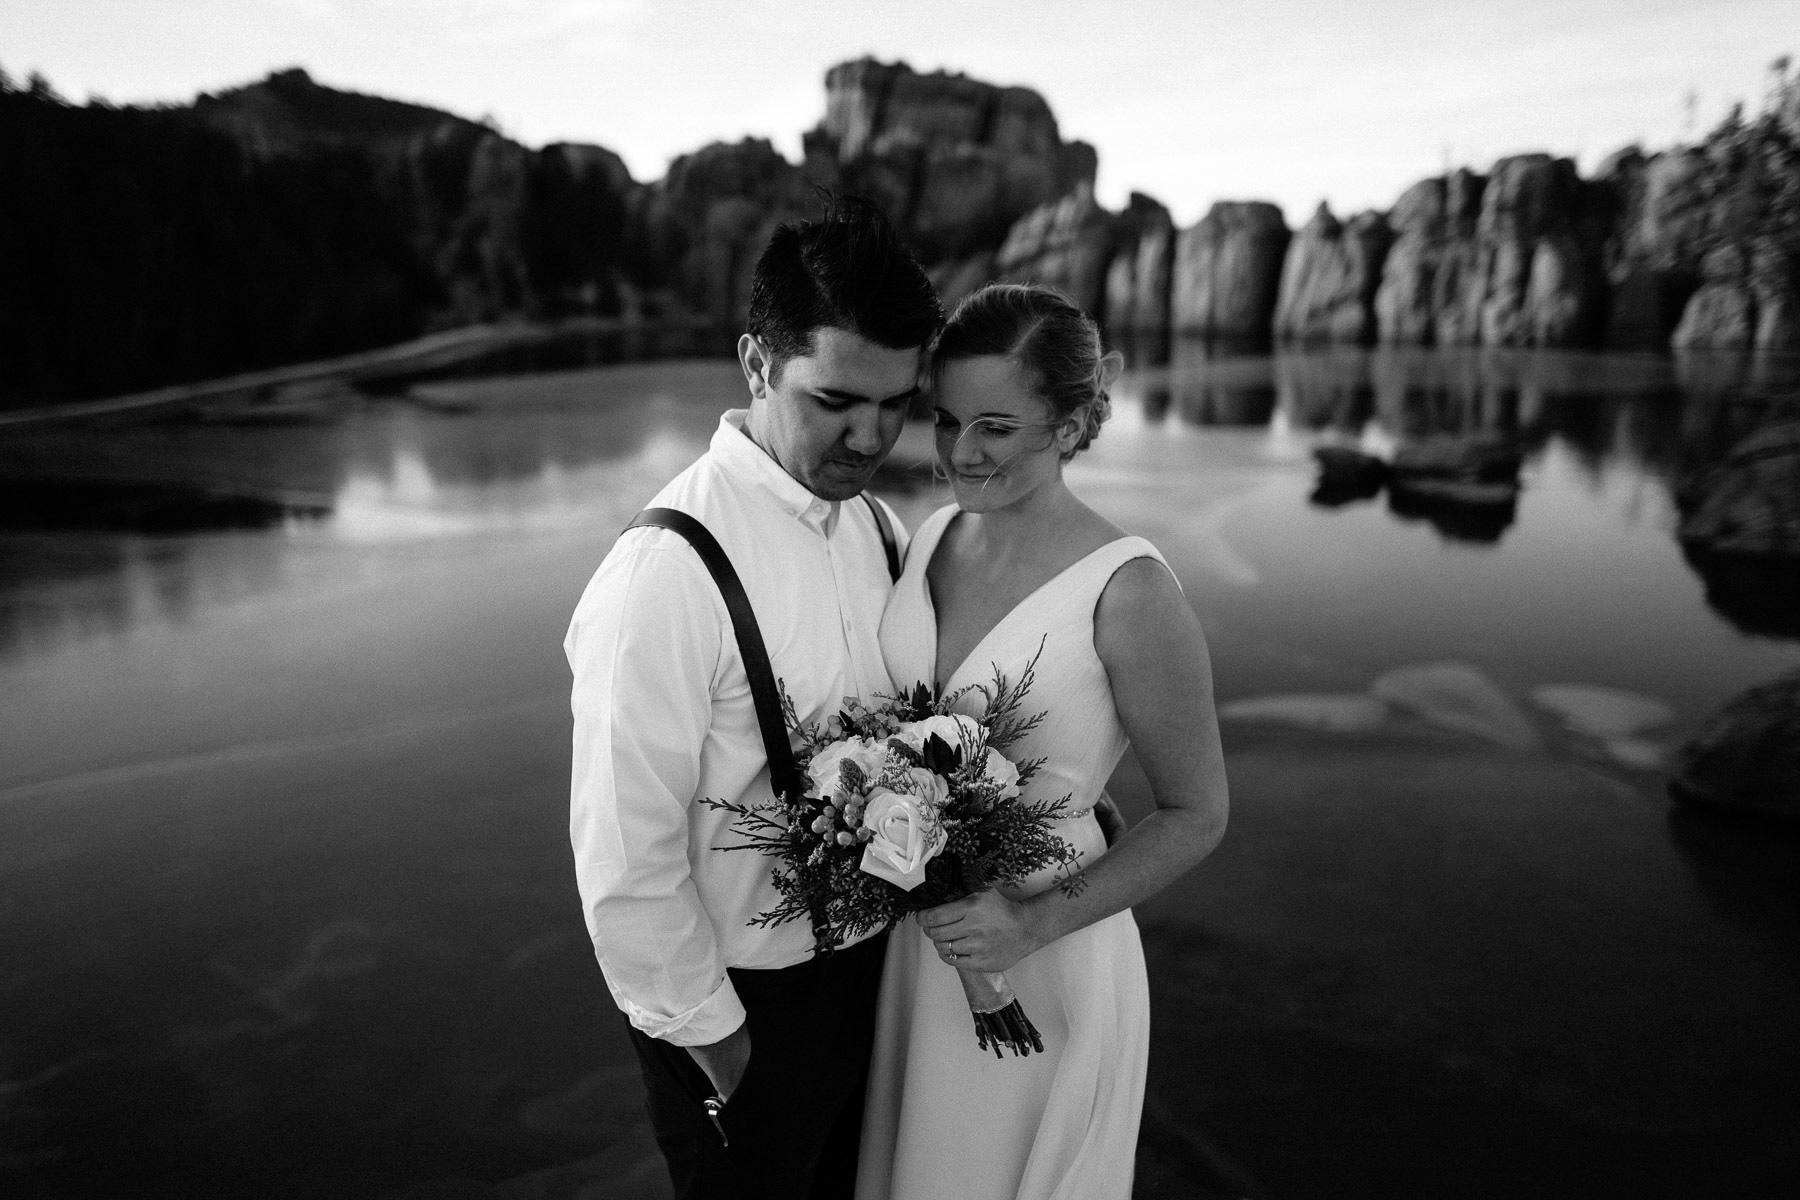 sioux-falls-black-hills-rapid-city-elopement-wedding-adventure-photographer-custer-sylvan-lake-27.jpg